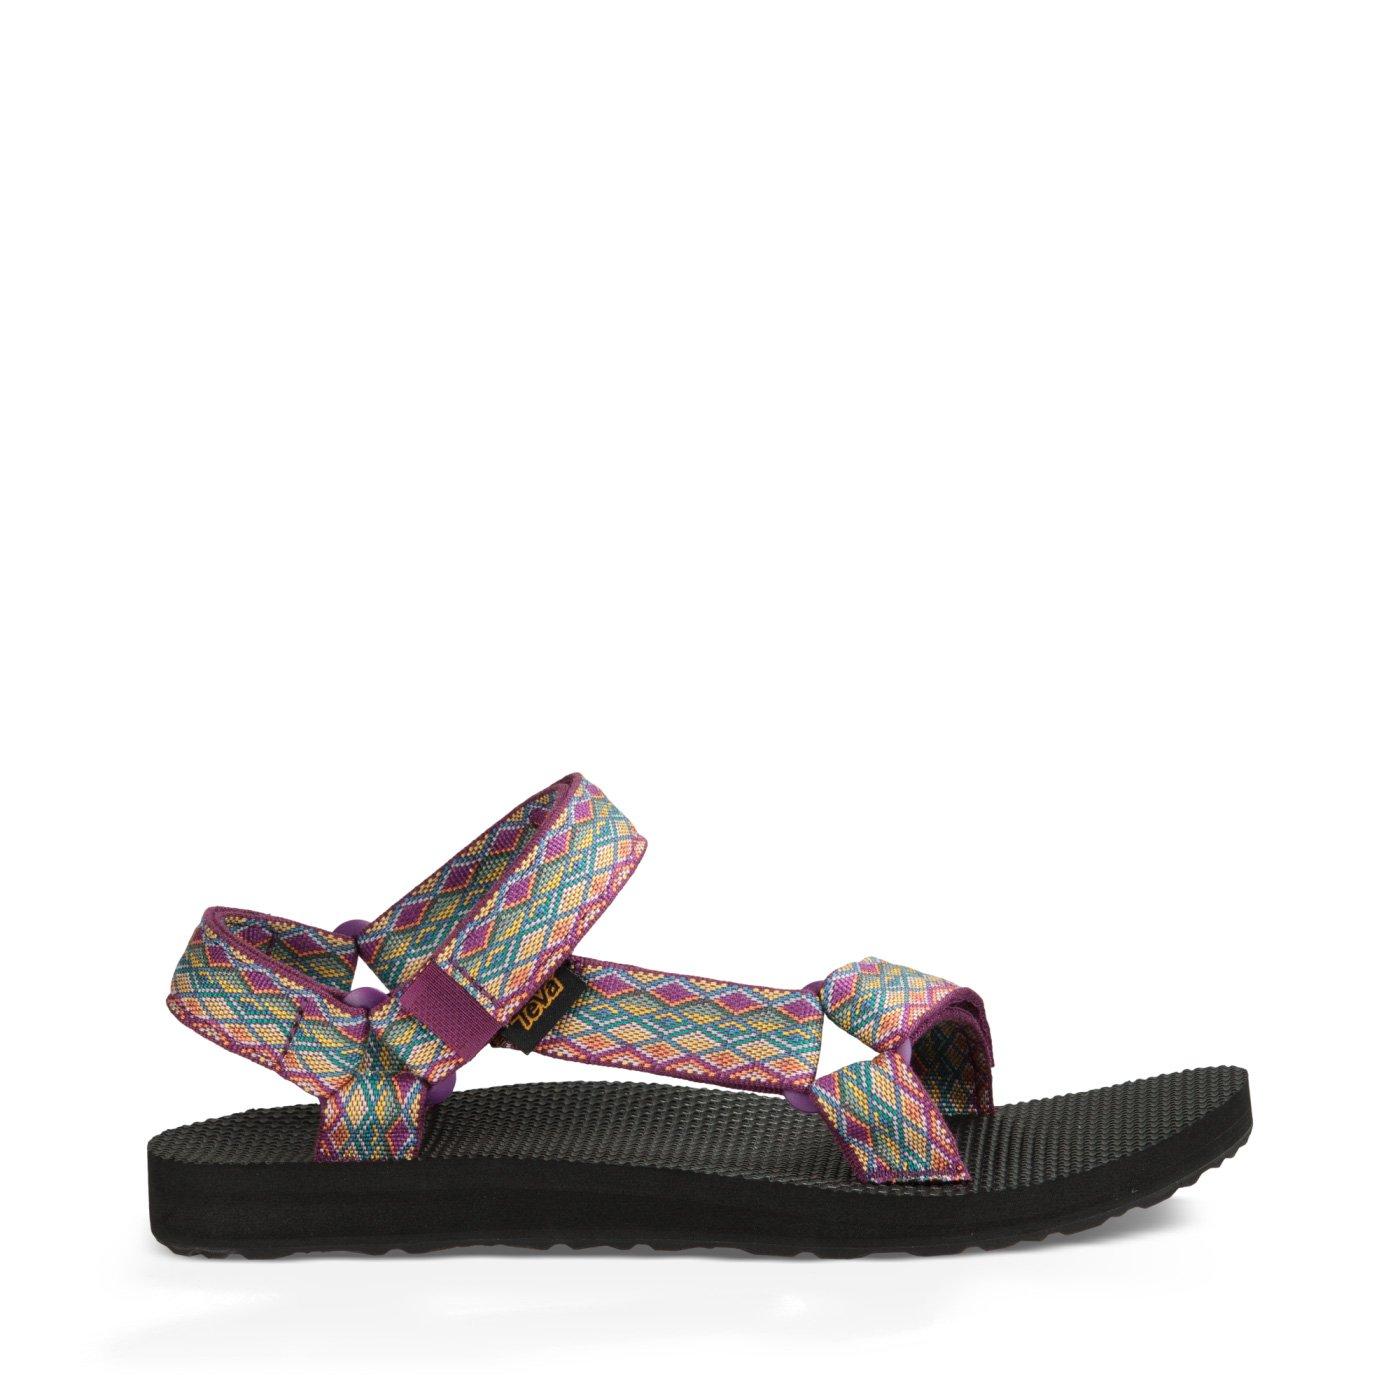 Teva Women's Original Universal Sandal B01IPXUQ3O 5 B(M) US|Miramar Fade Dark Purple/Multi